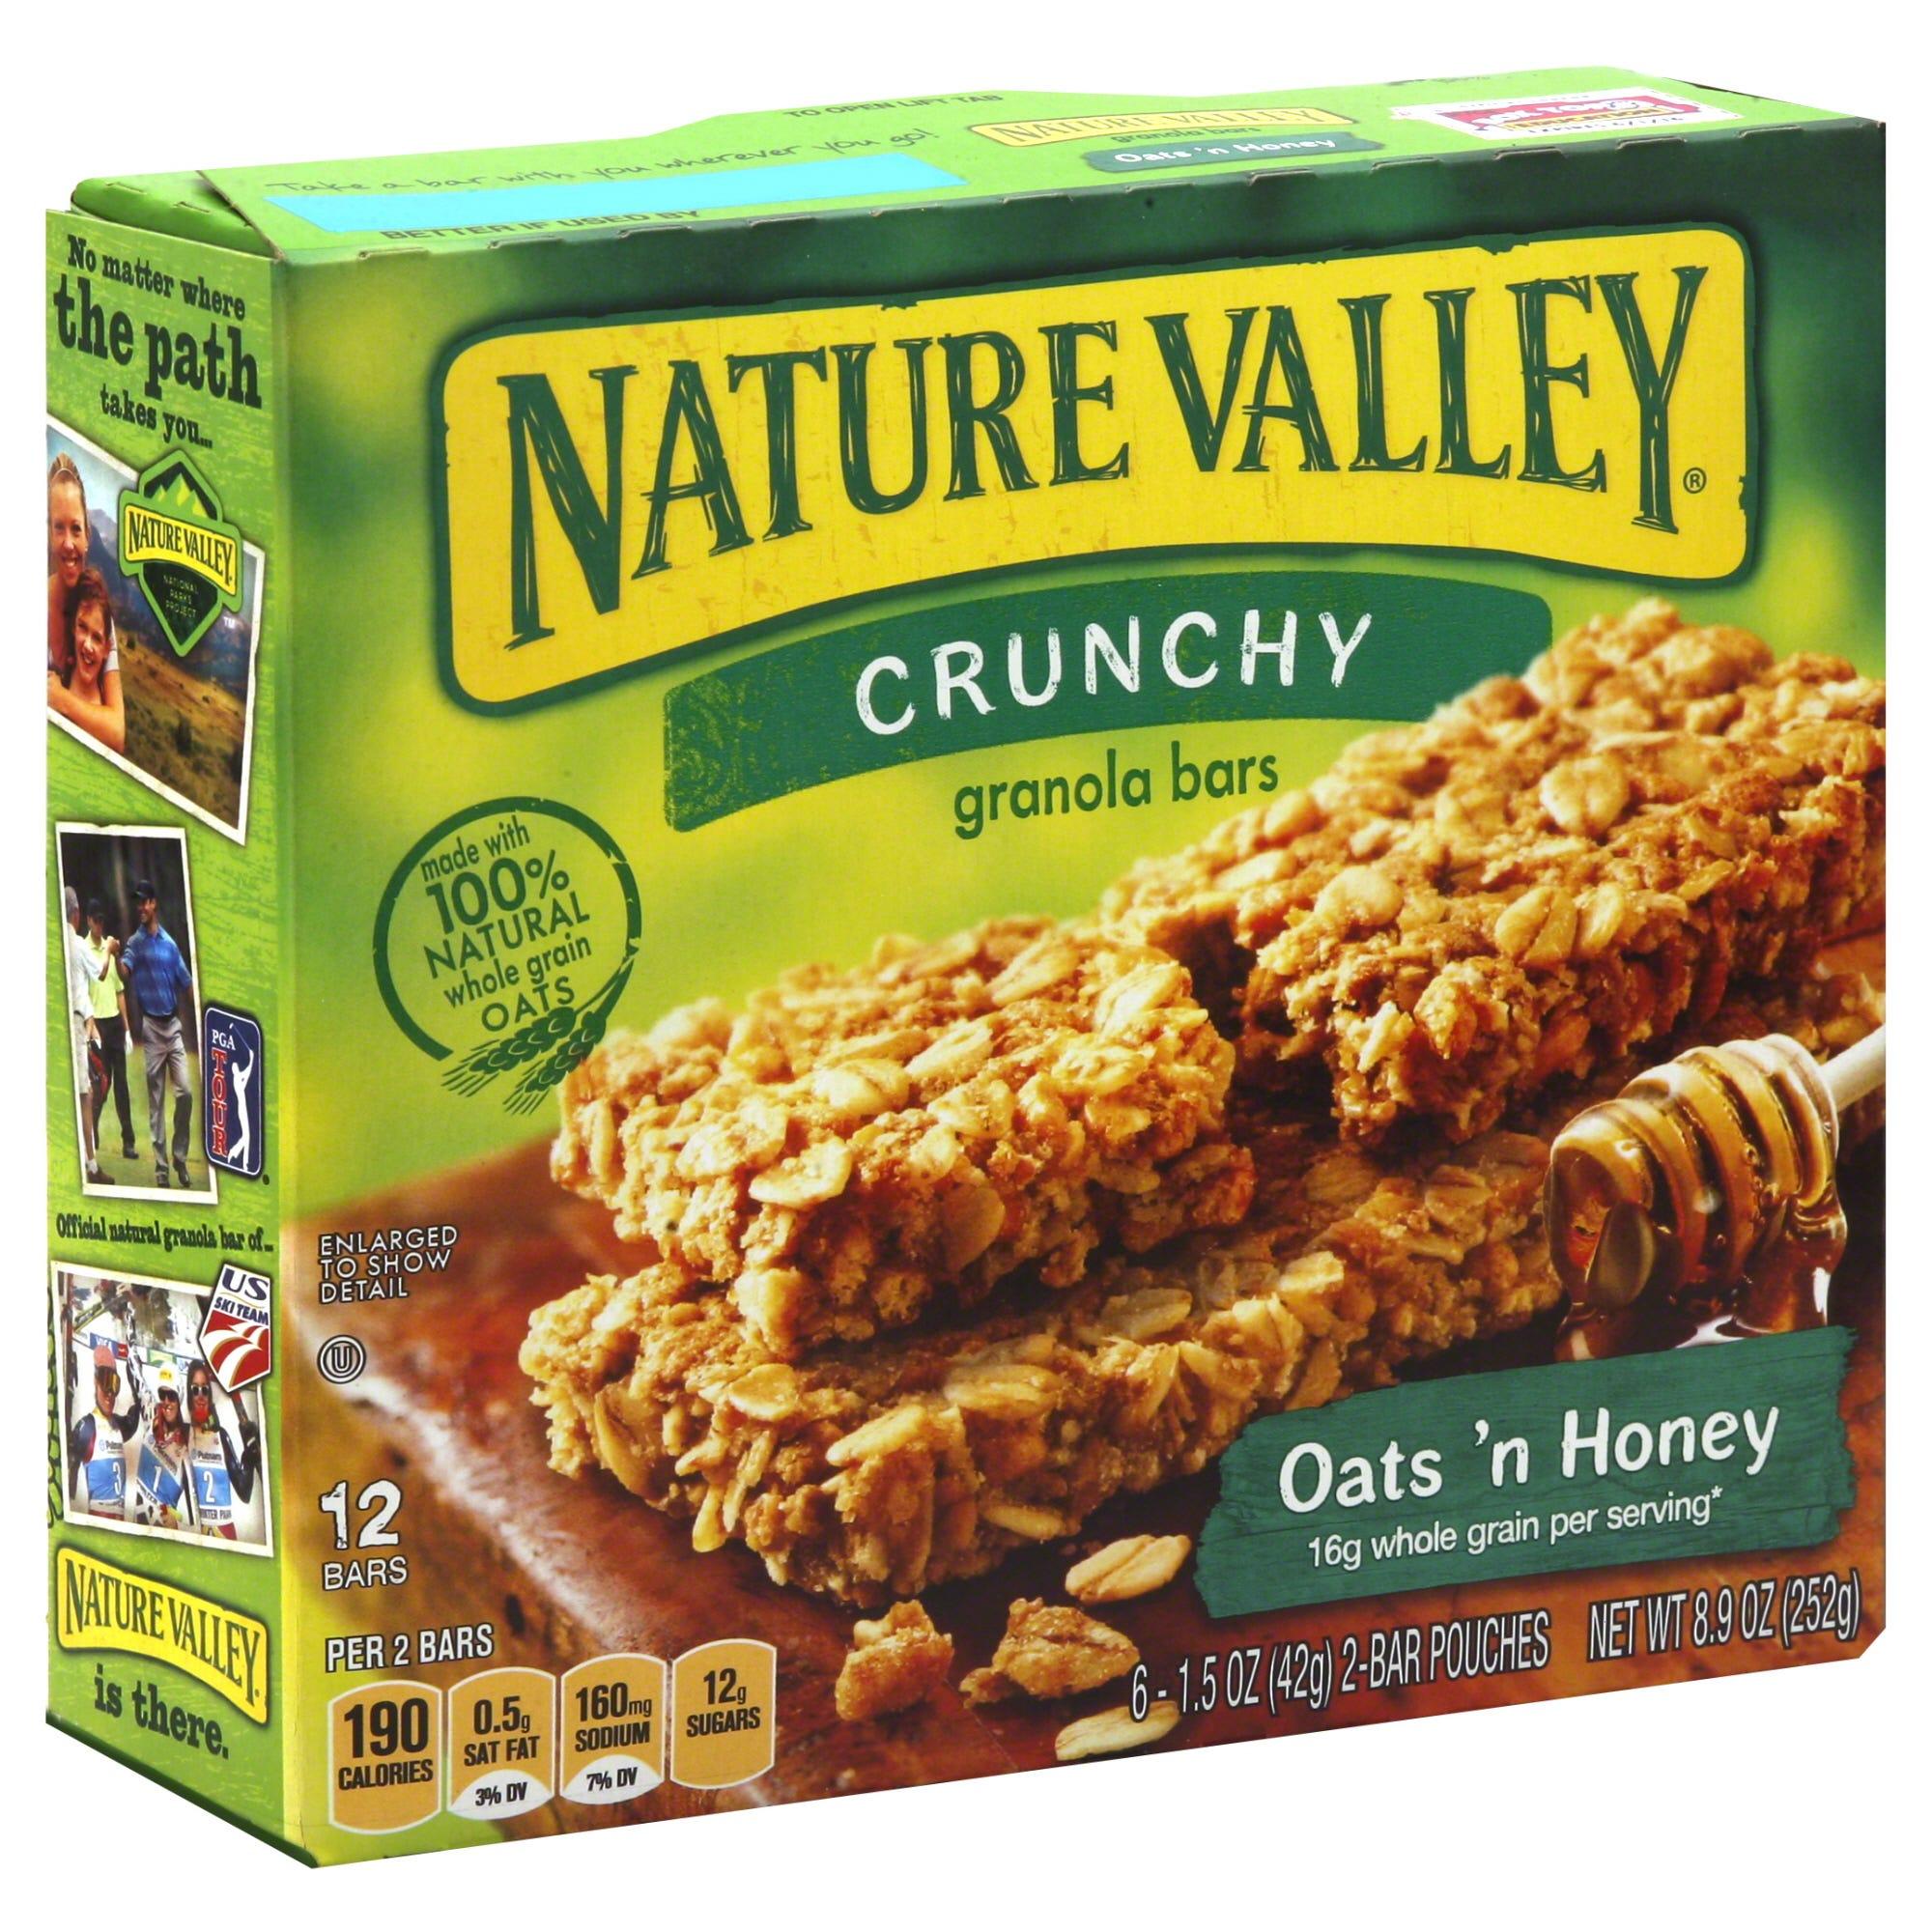 Nature Valley Granola Bars, Crunchy